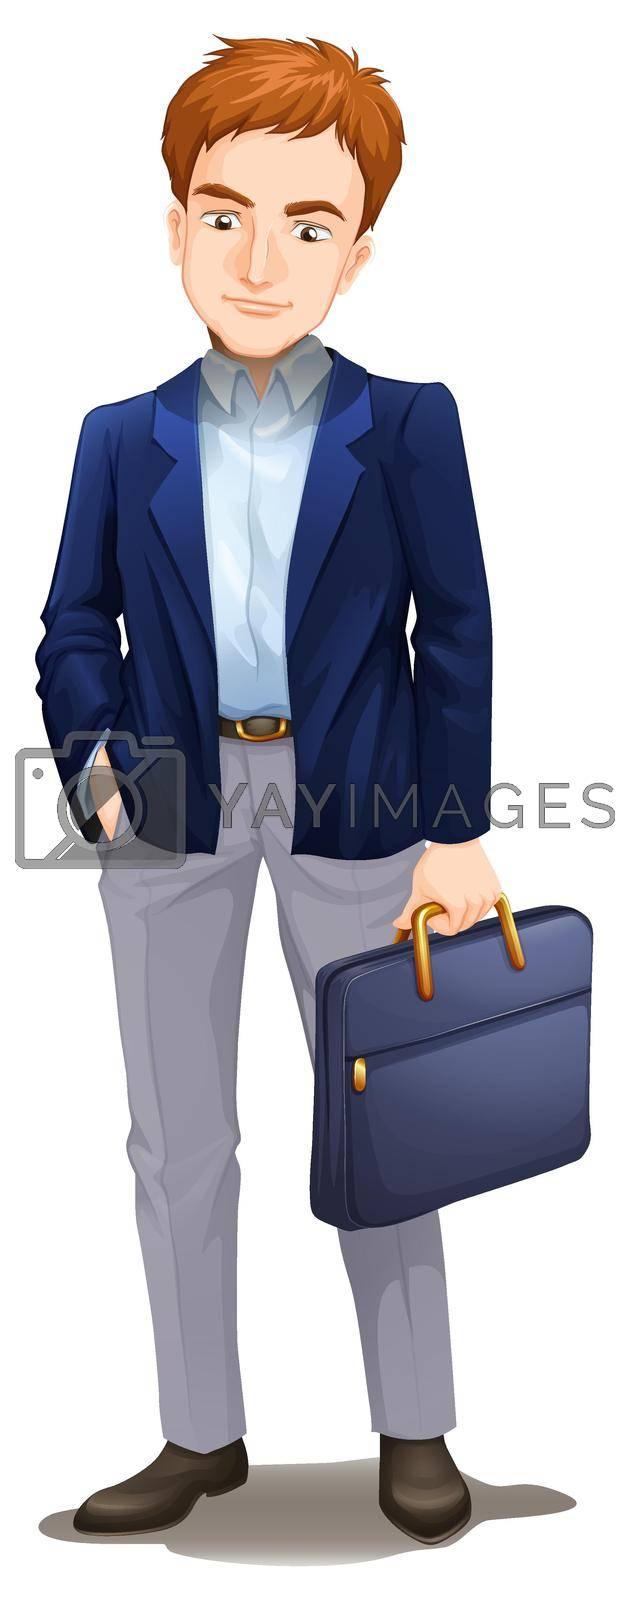 A Smart Businessman on White Background illustration